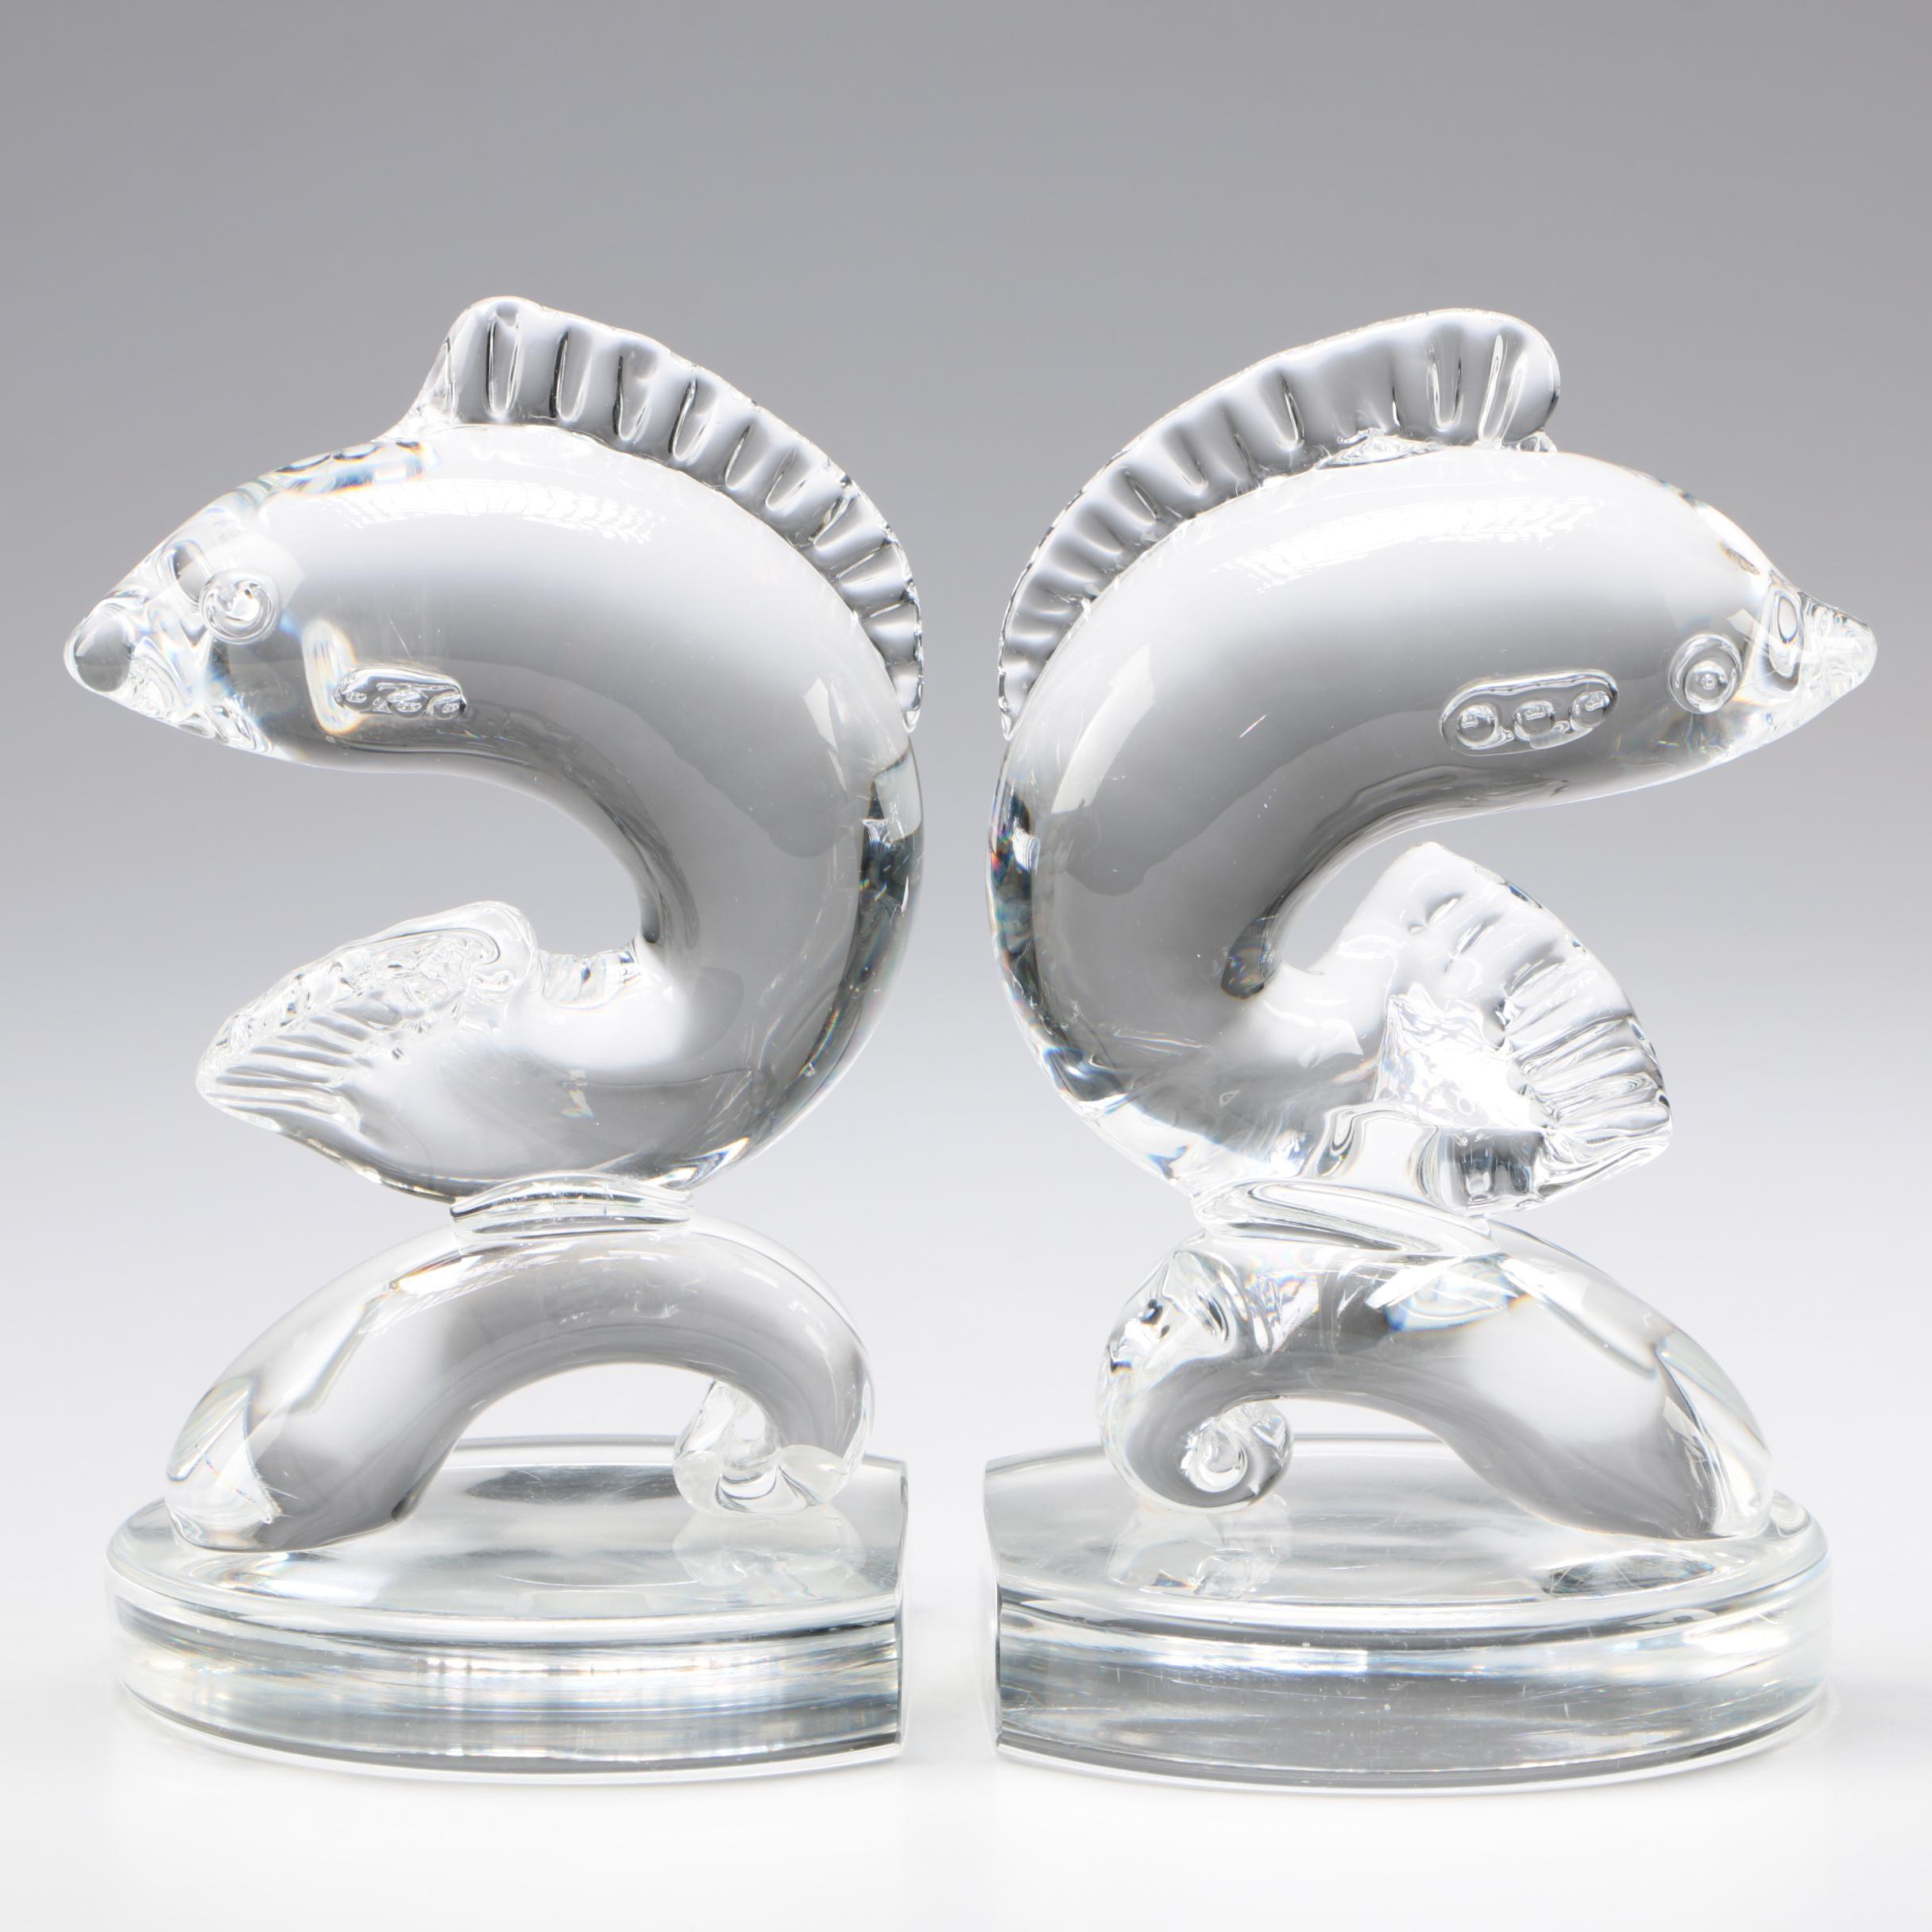 "Steuben Art Glass ""Dolphin"" Bookends, c.1930 - 1940s"